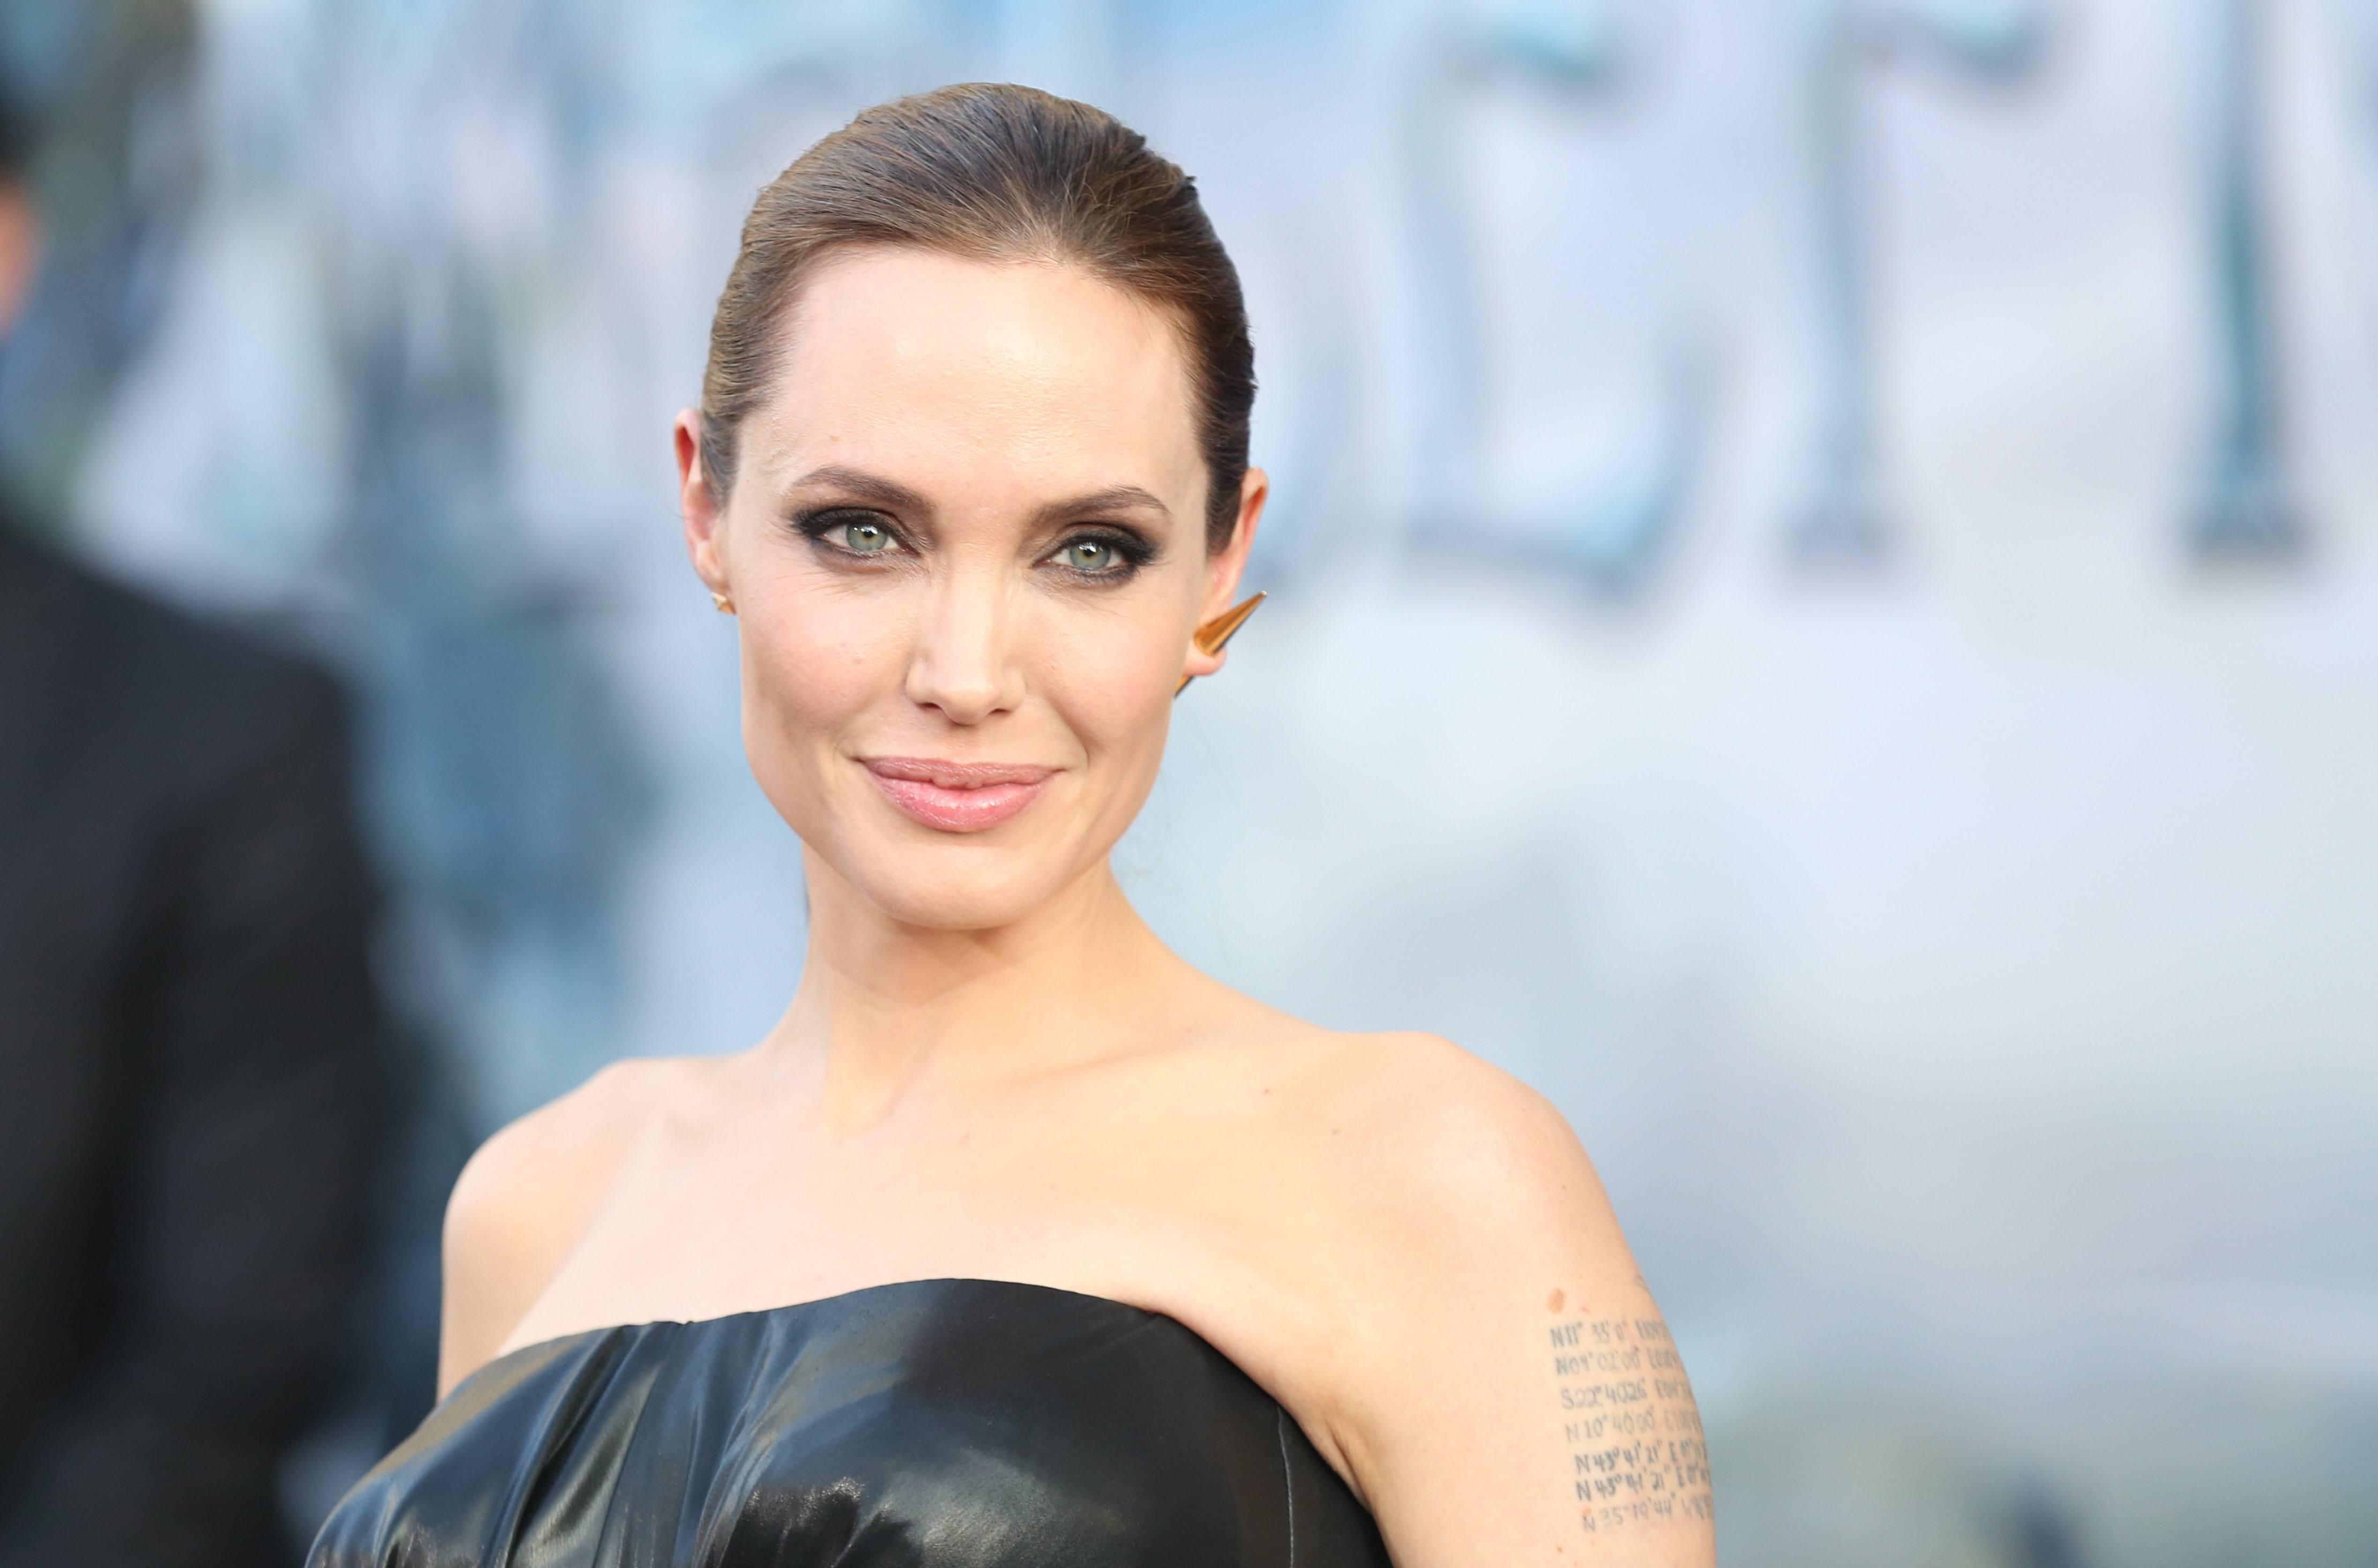 Angelina Jolie now weighs 35 kilograms